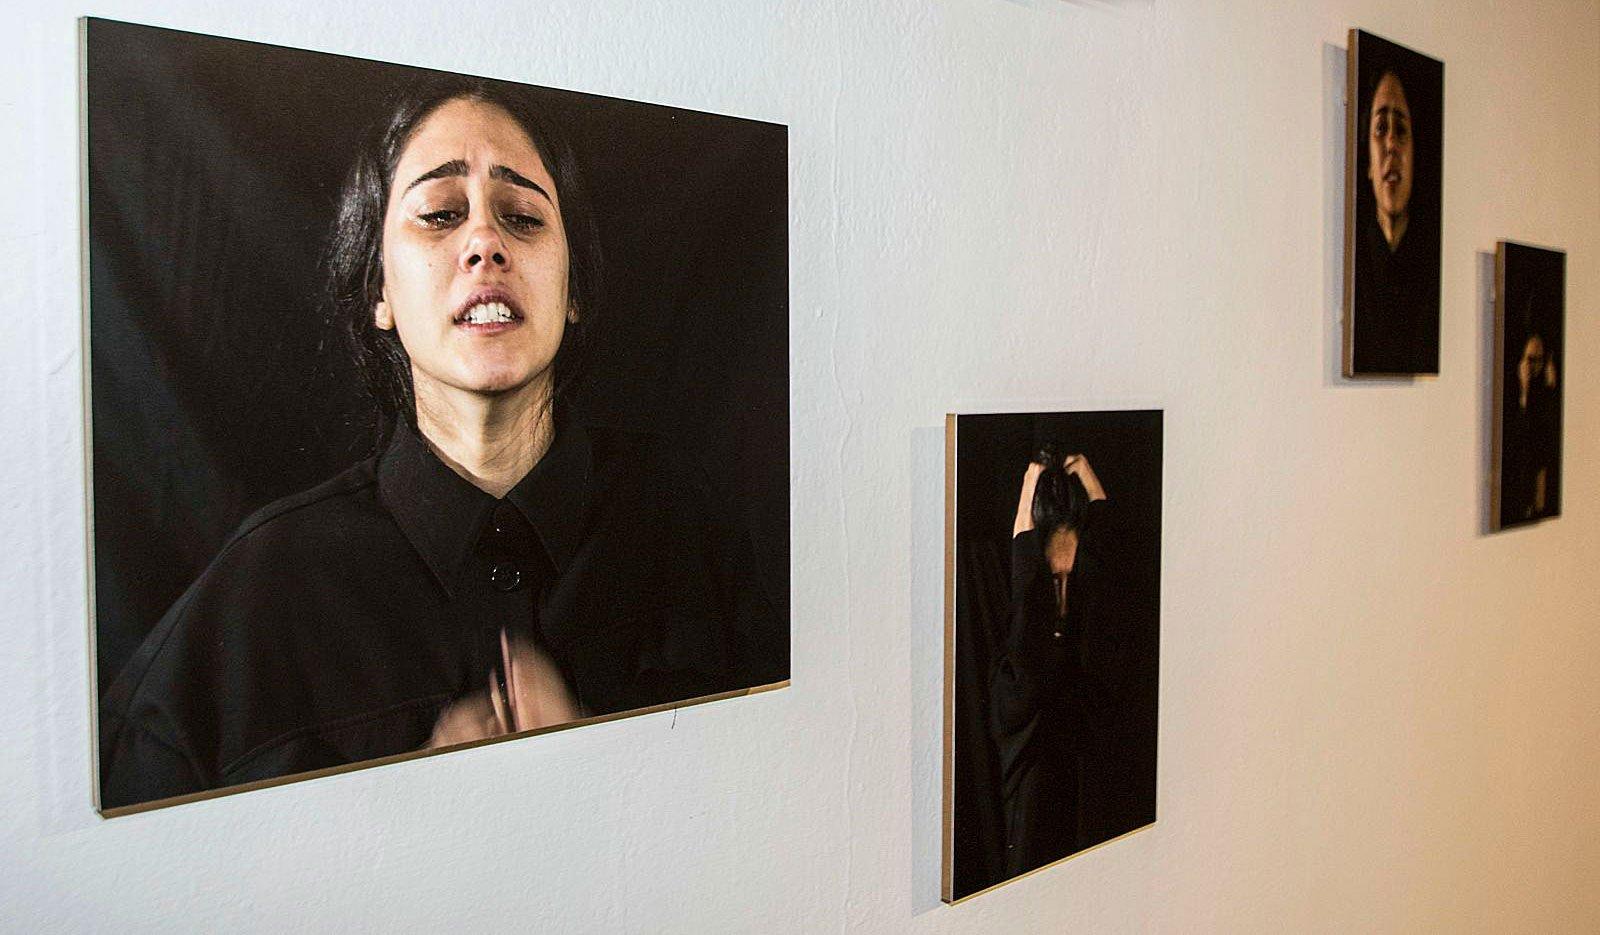 Alejandra-Glez-exposición-homenaje-a-Ana-Mendieta-La-Habana